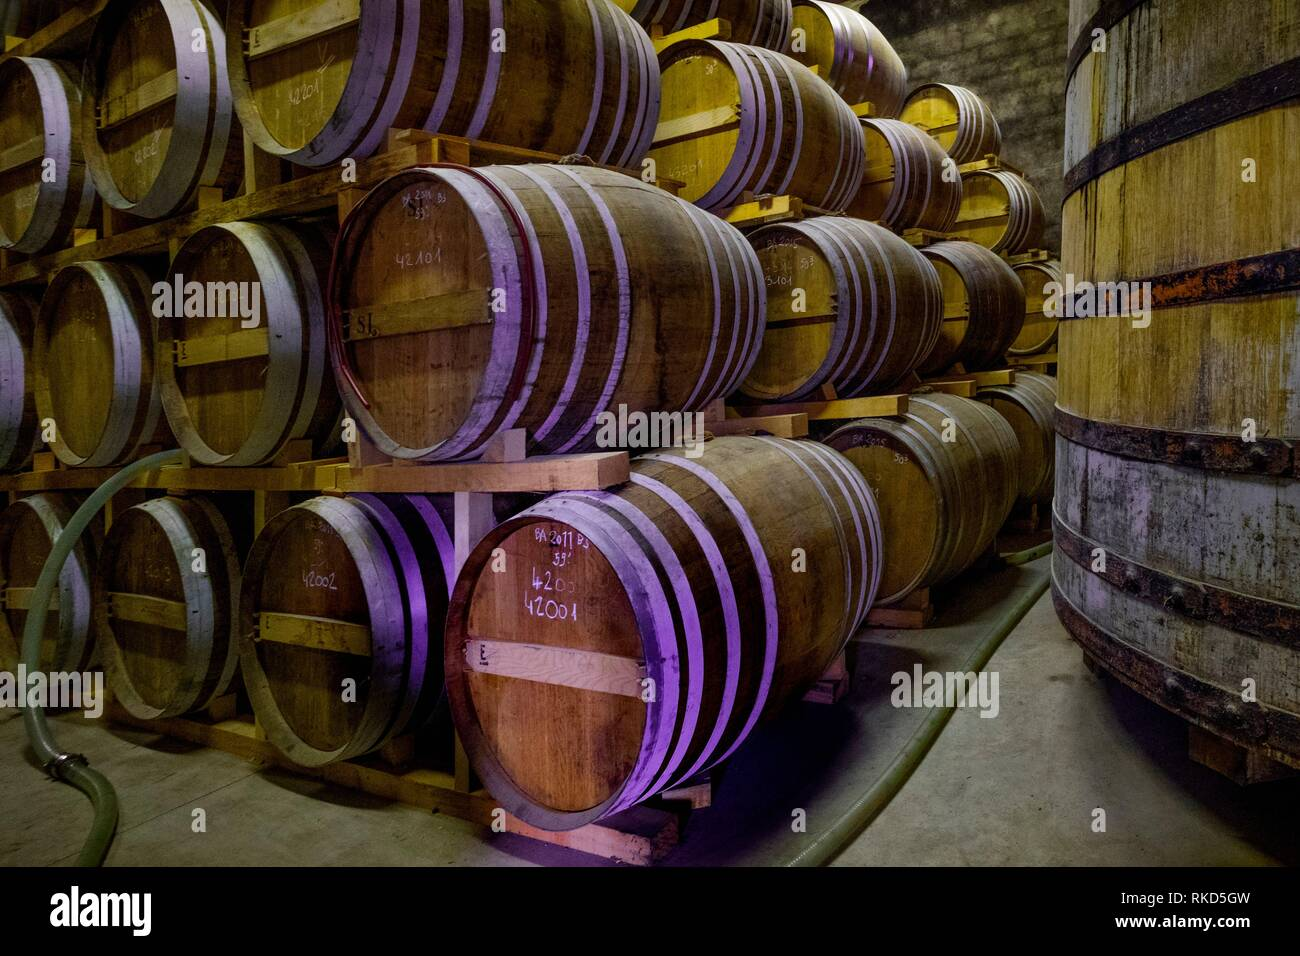 Frankreich, Royal, Gers, an der ''Armagnac Delord Immobilien'' Lannepax. Keller, wo die Armagnacs des Alterns sind. Stockbild